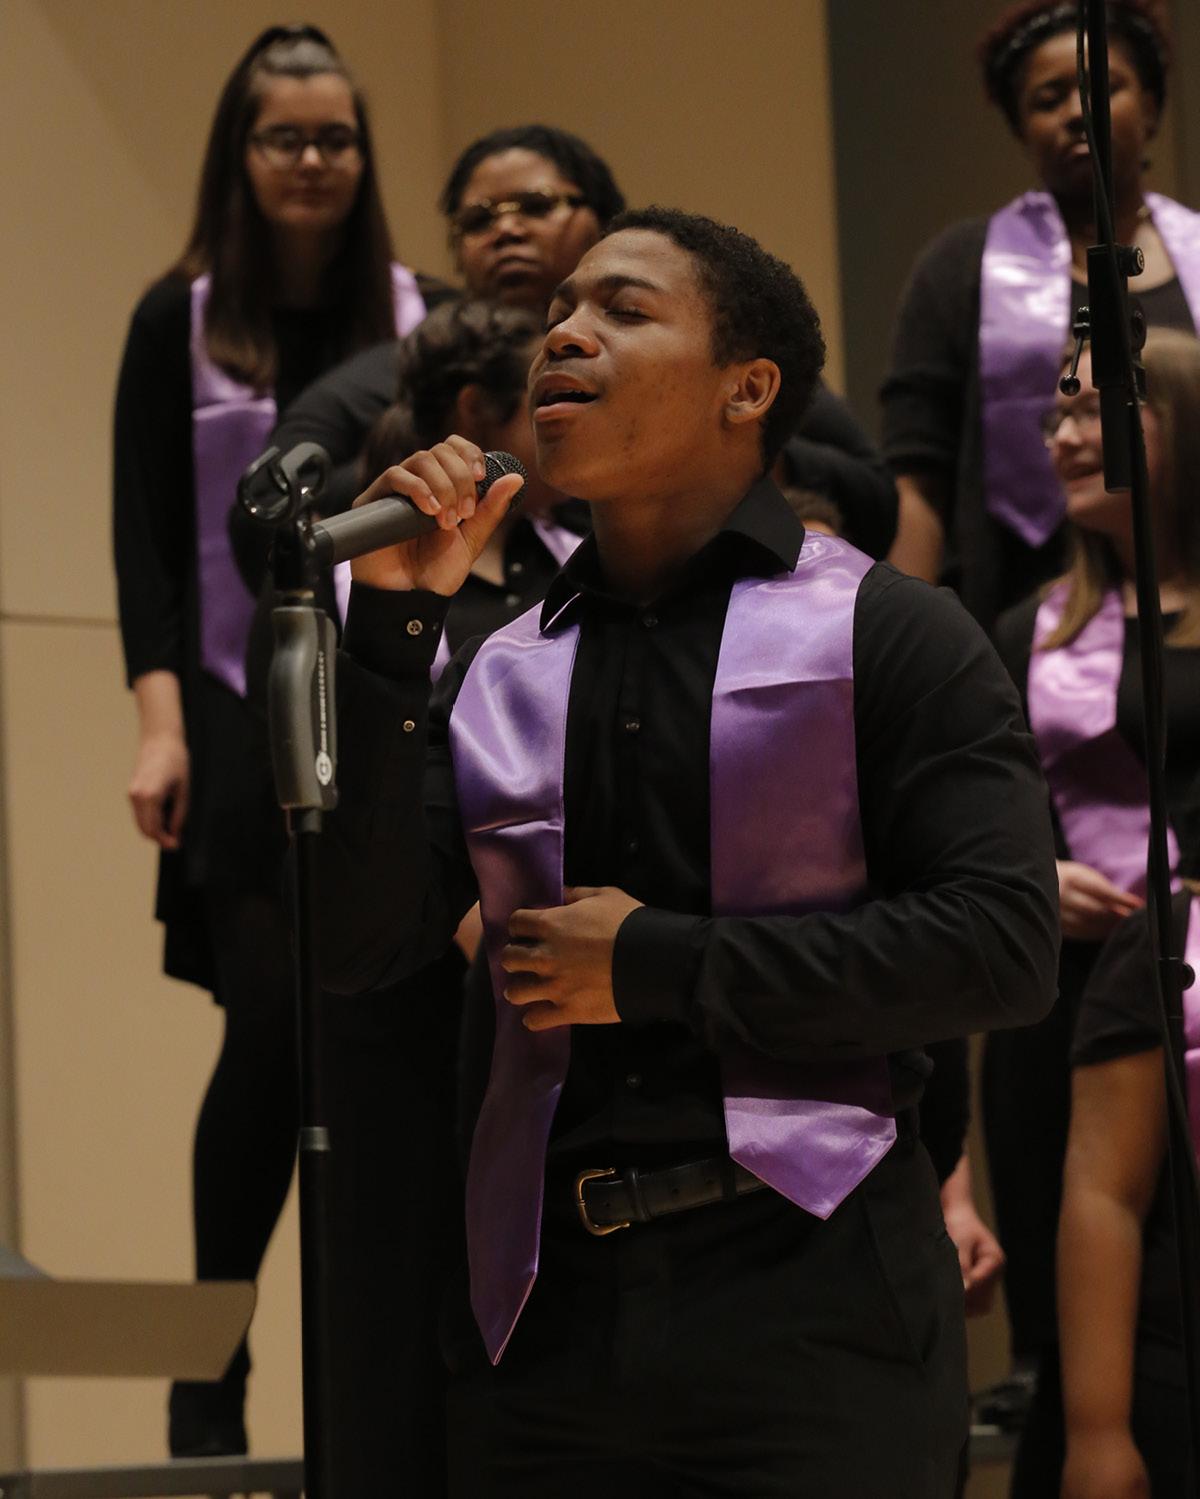 Students singing in KSU Gospel Choir